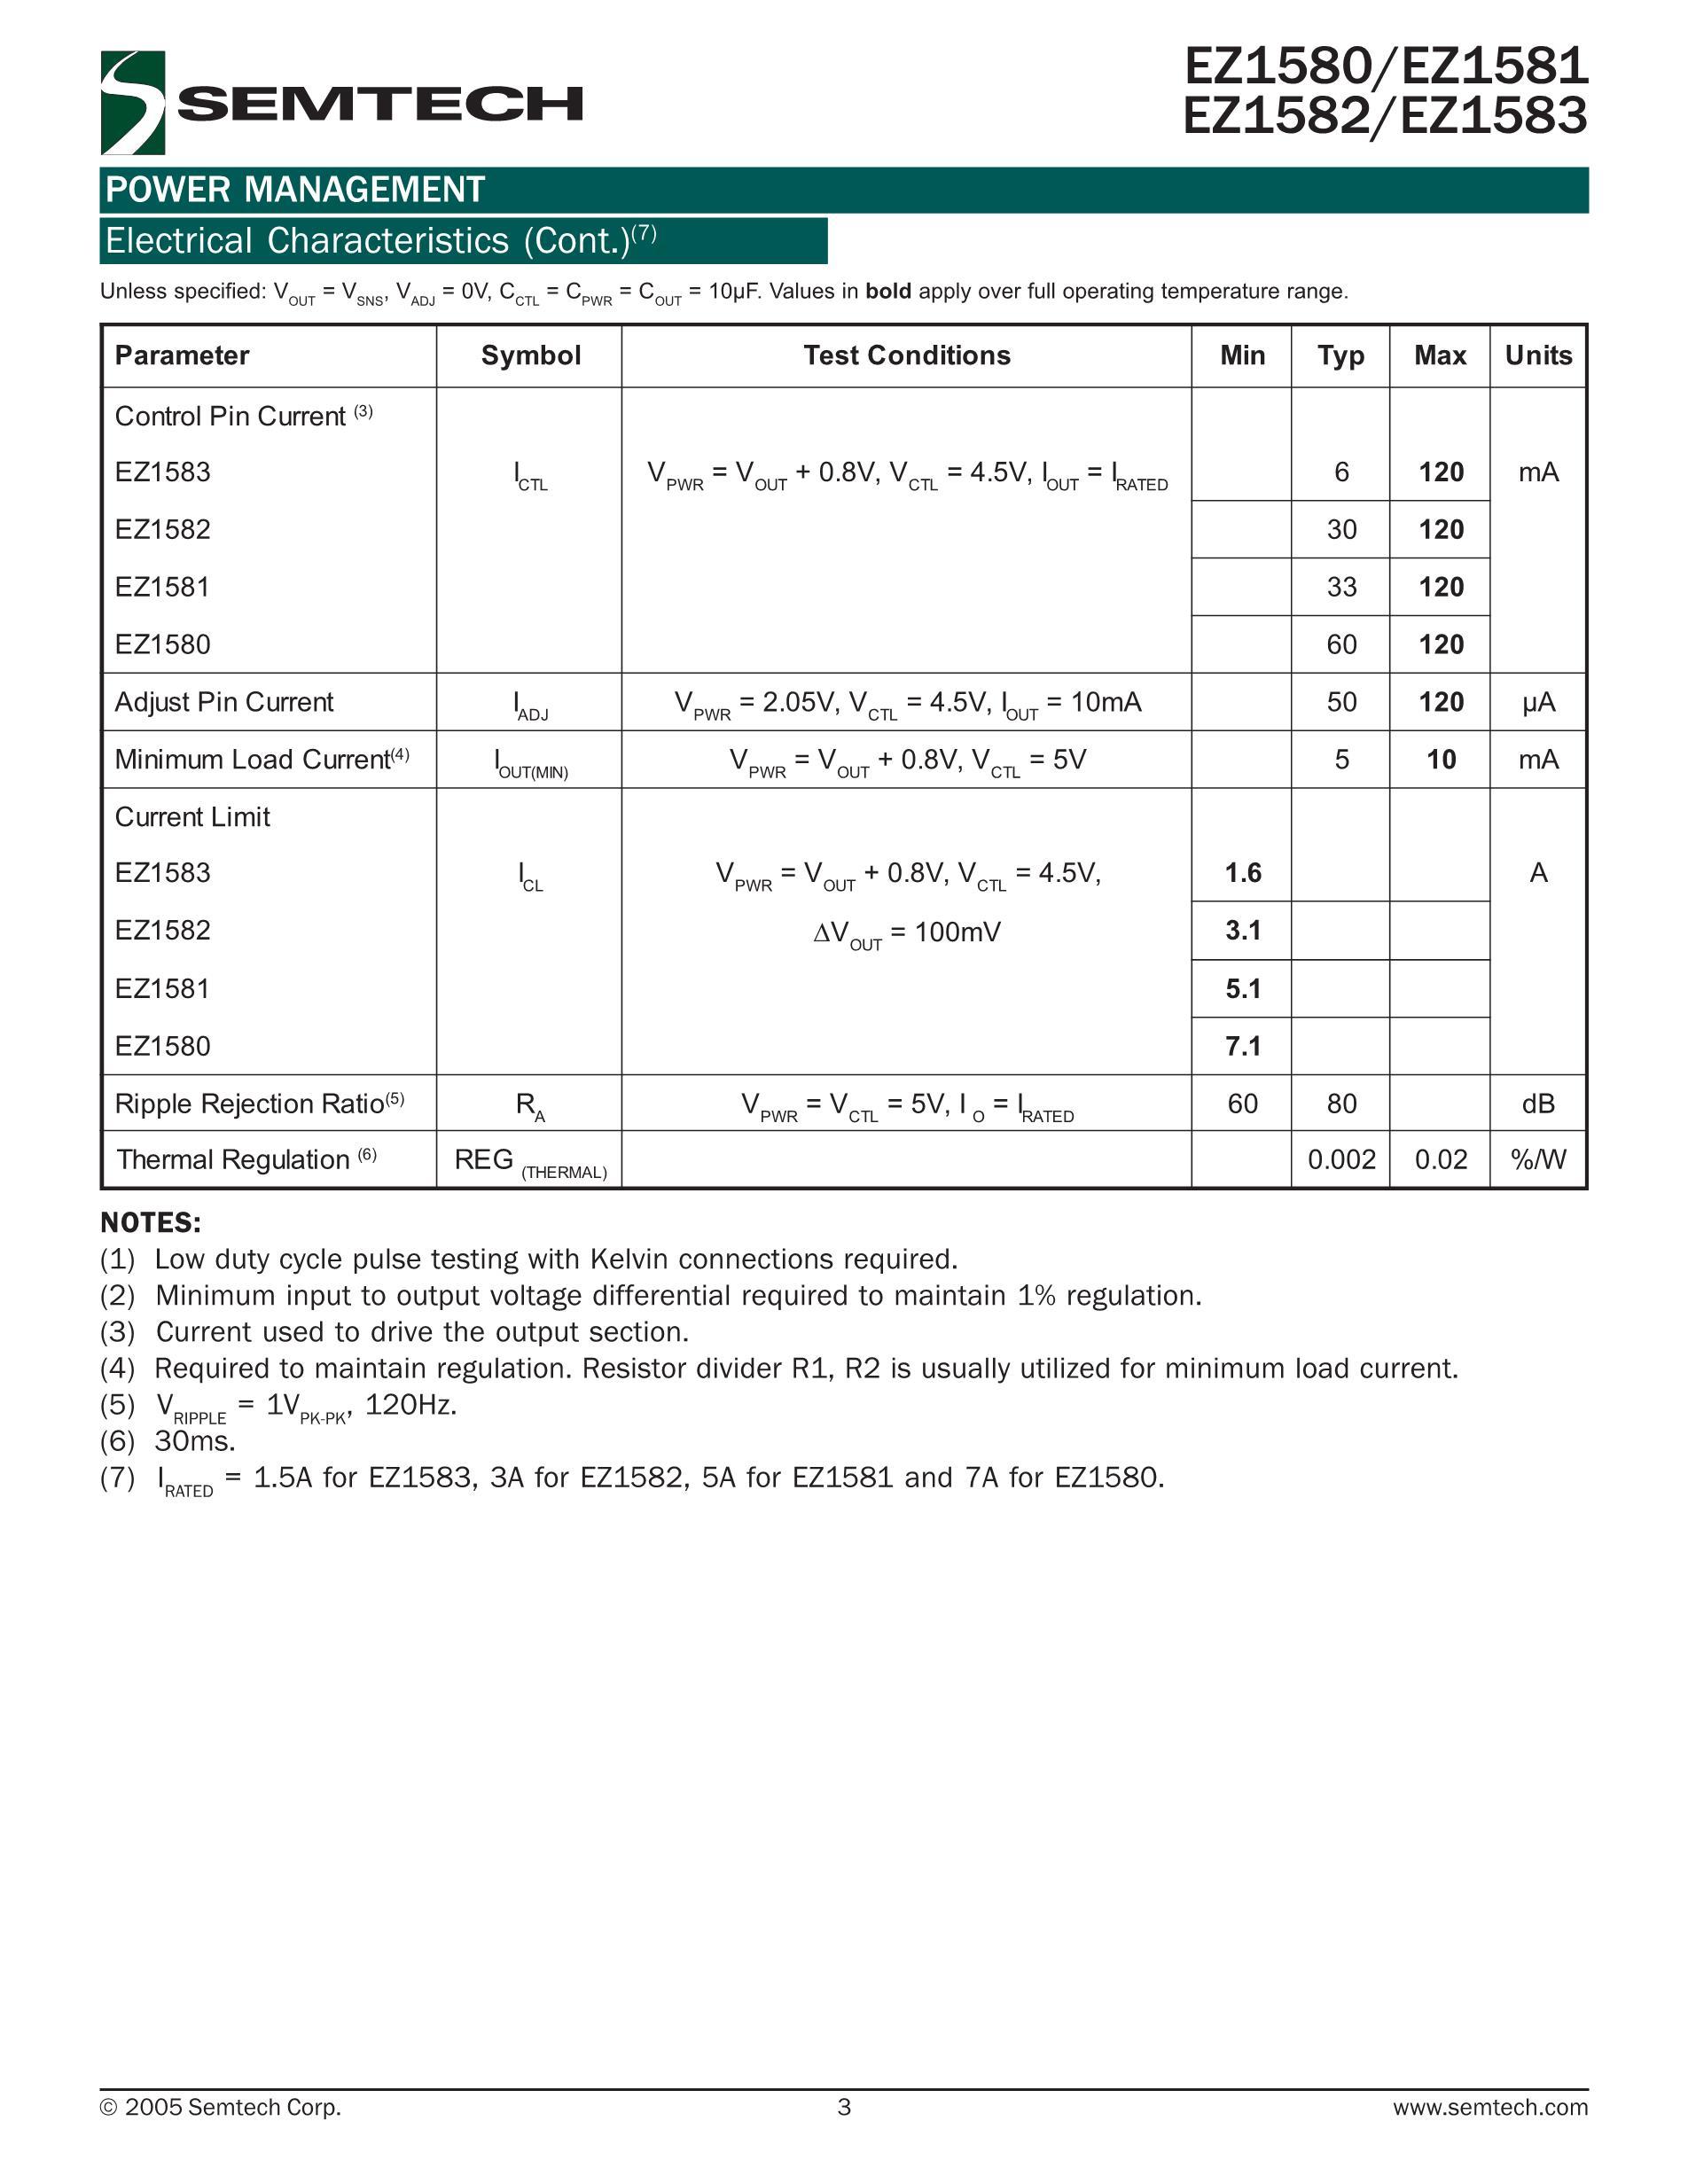 CM-2M2012-181JT's pdf picture 3